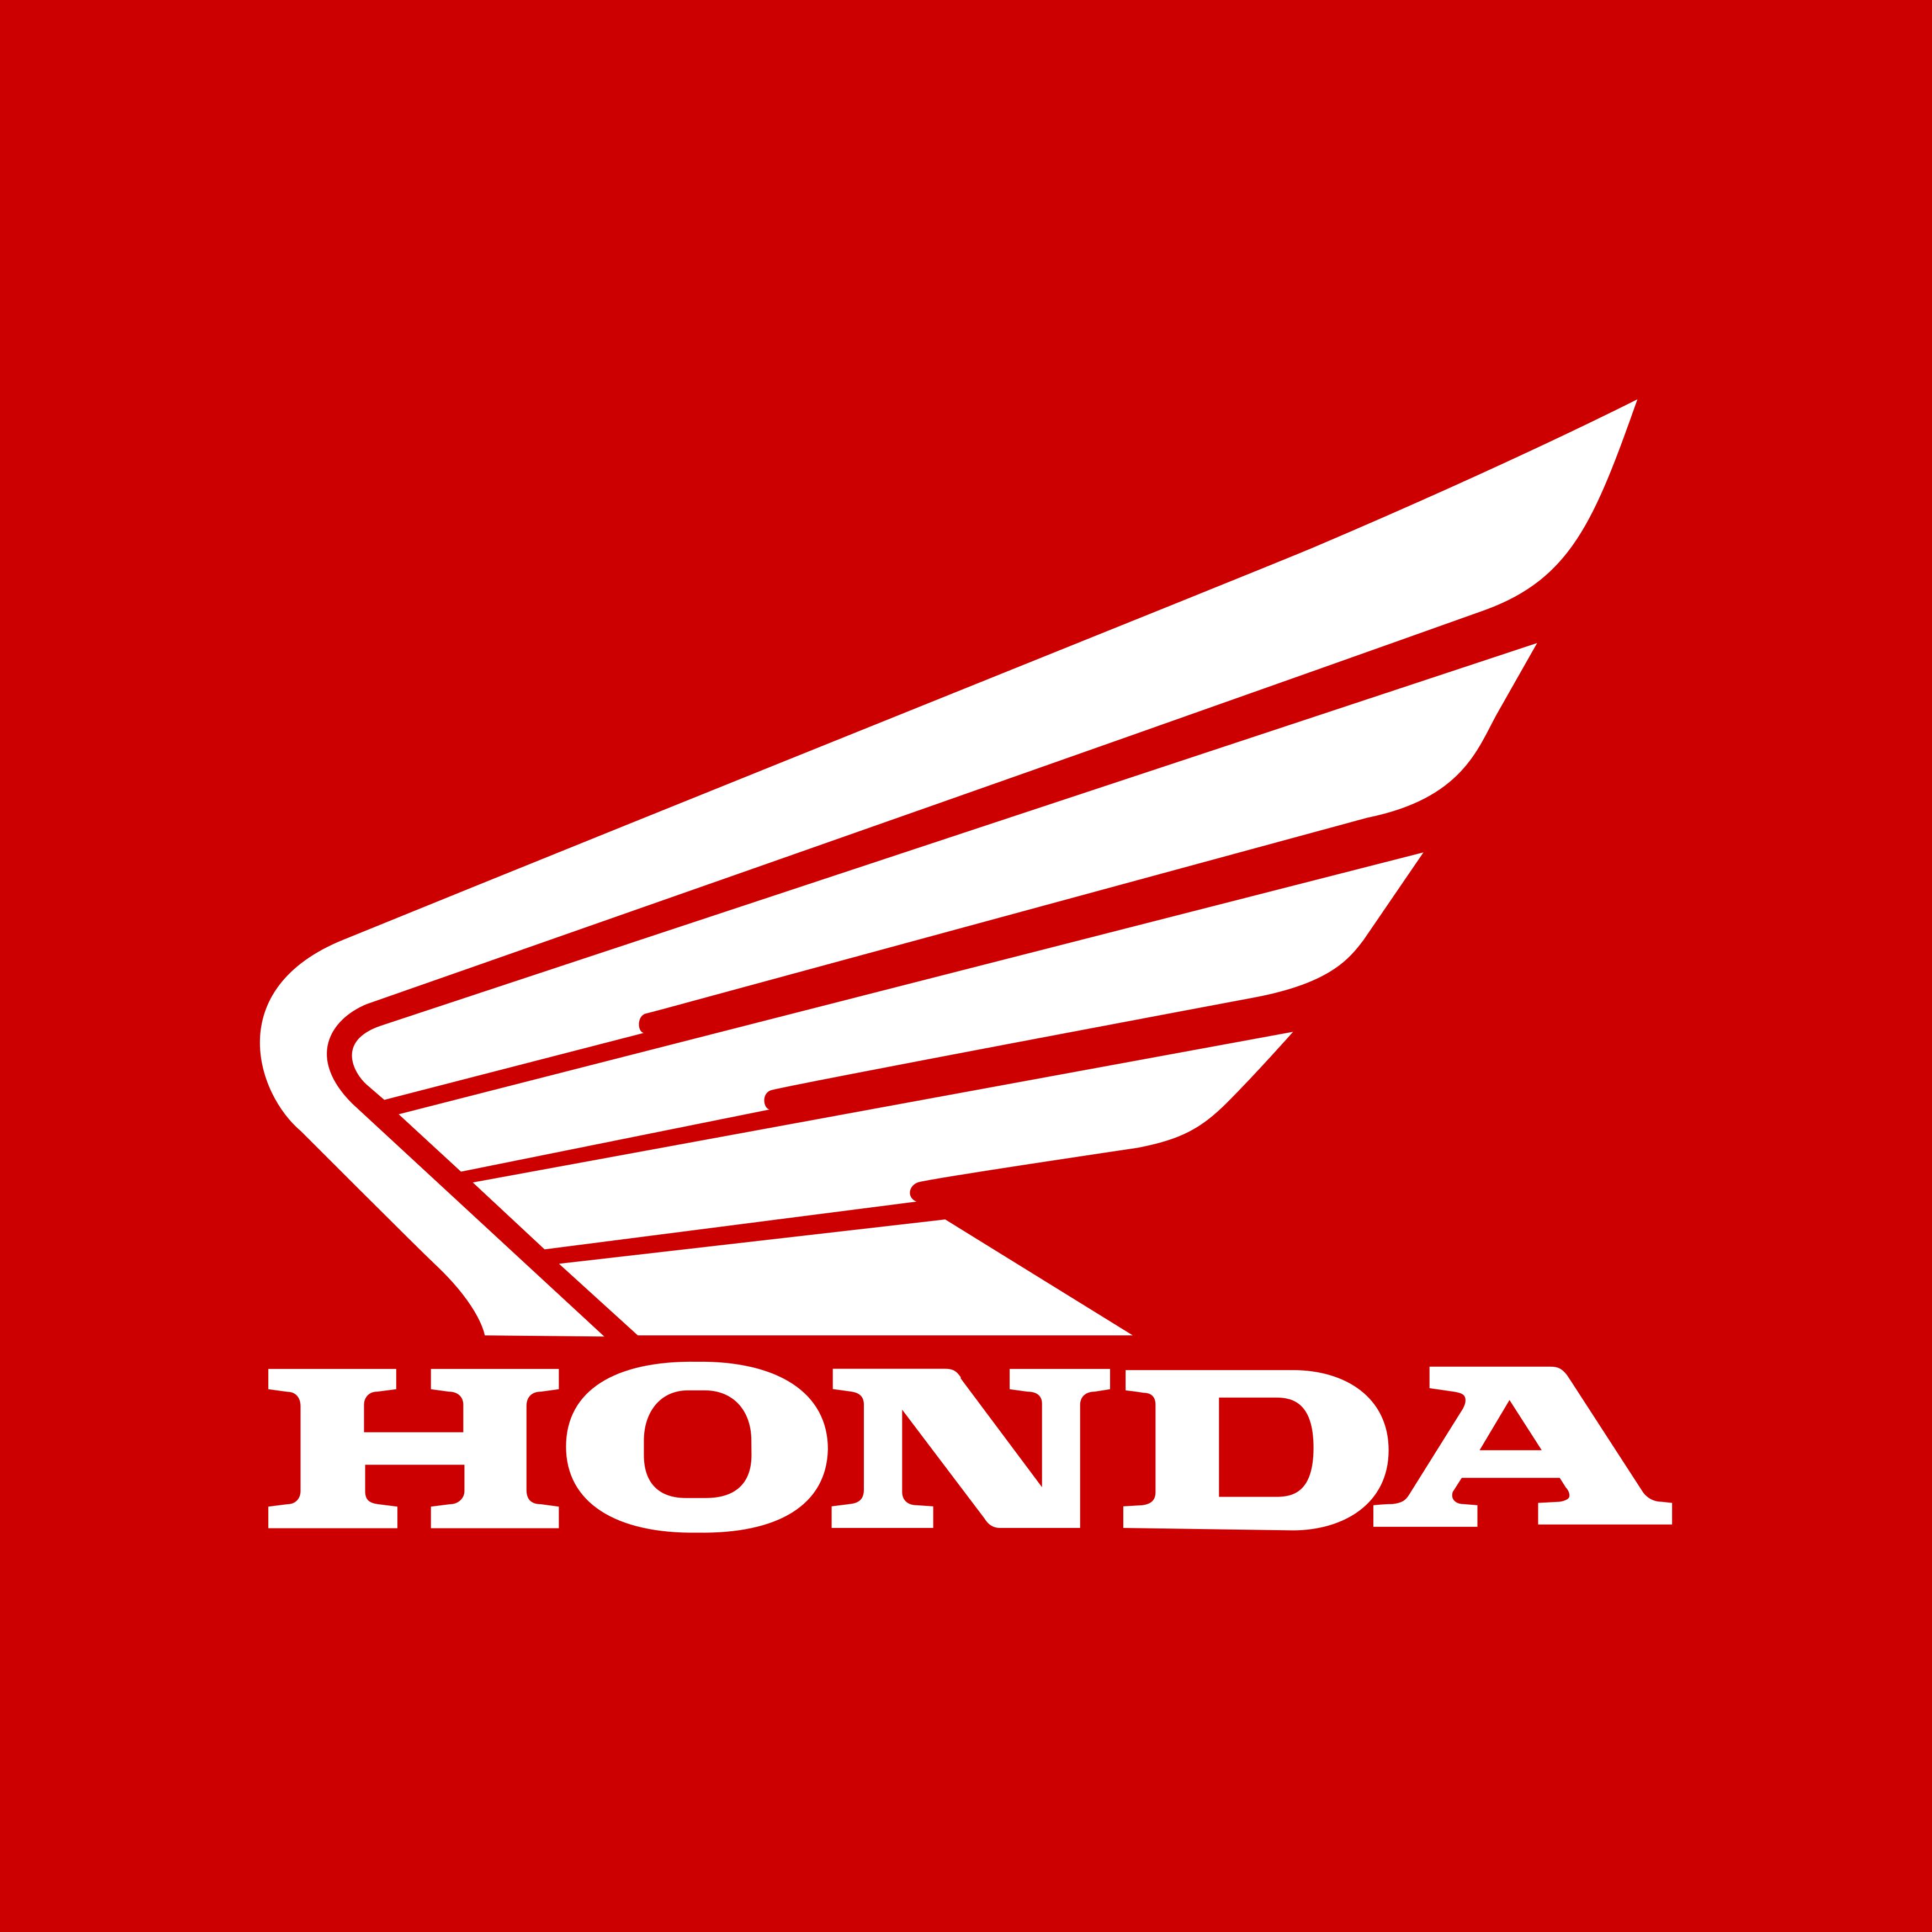 honda motos logo 01 - Honda Motorcycles Logo